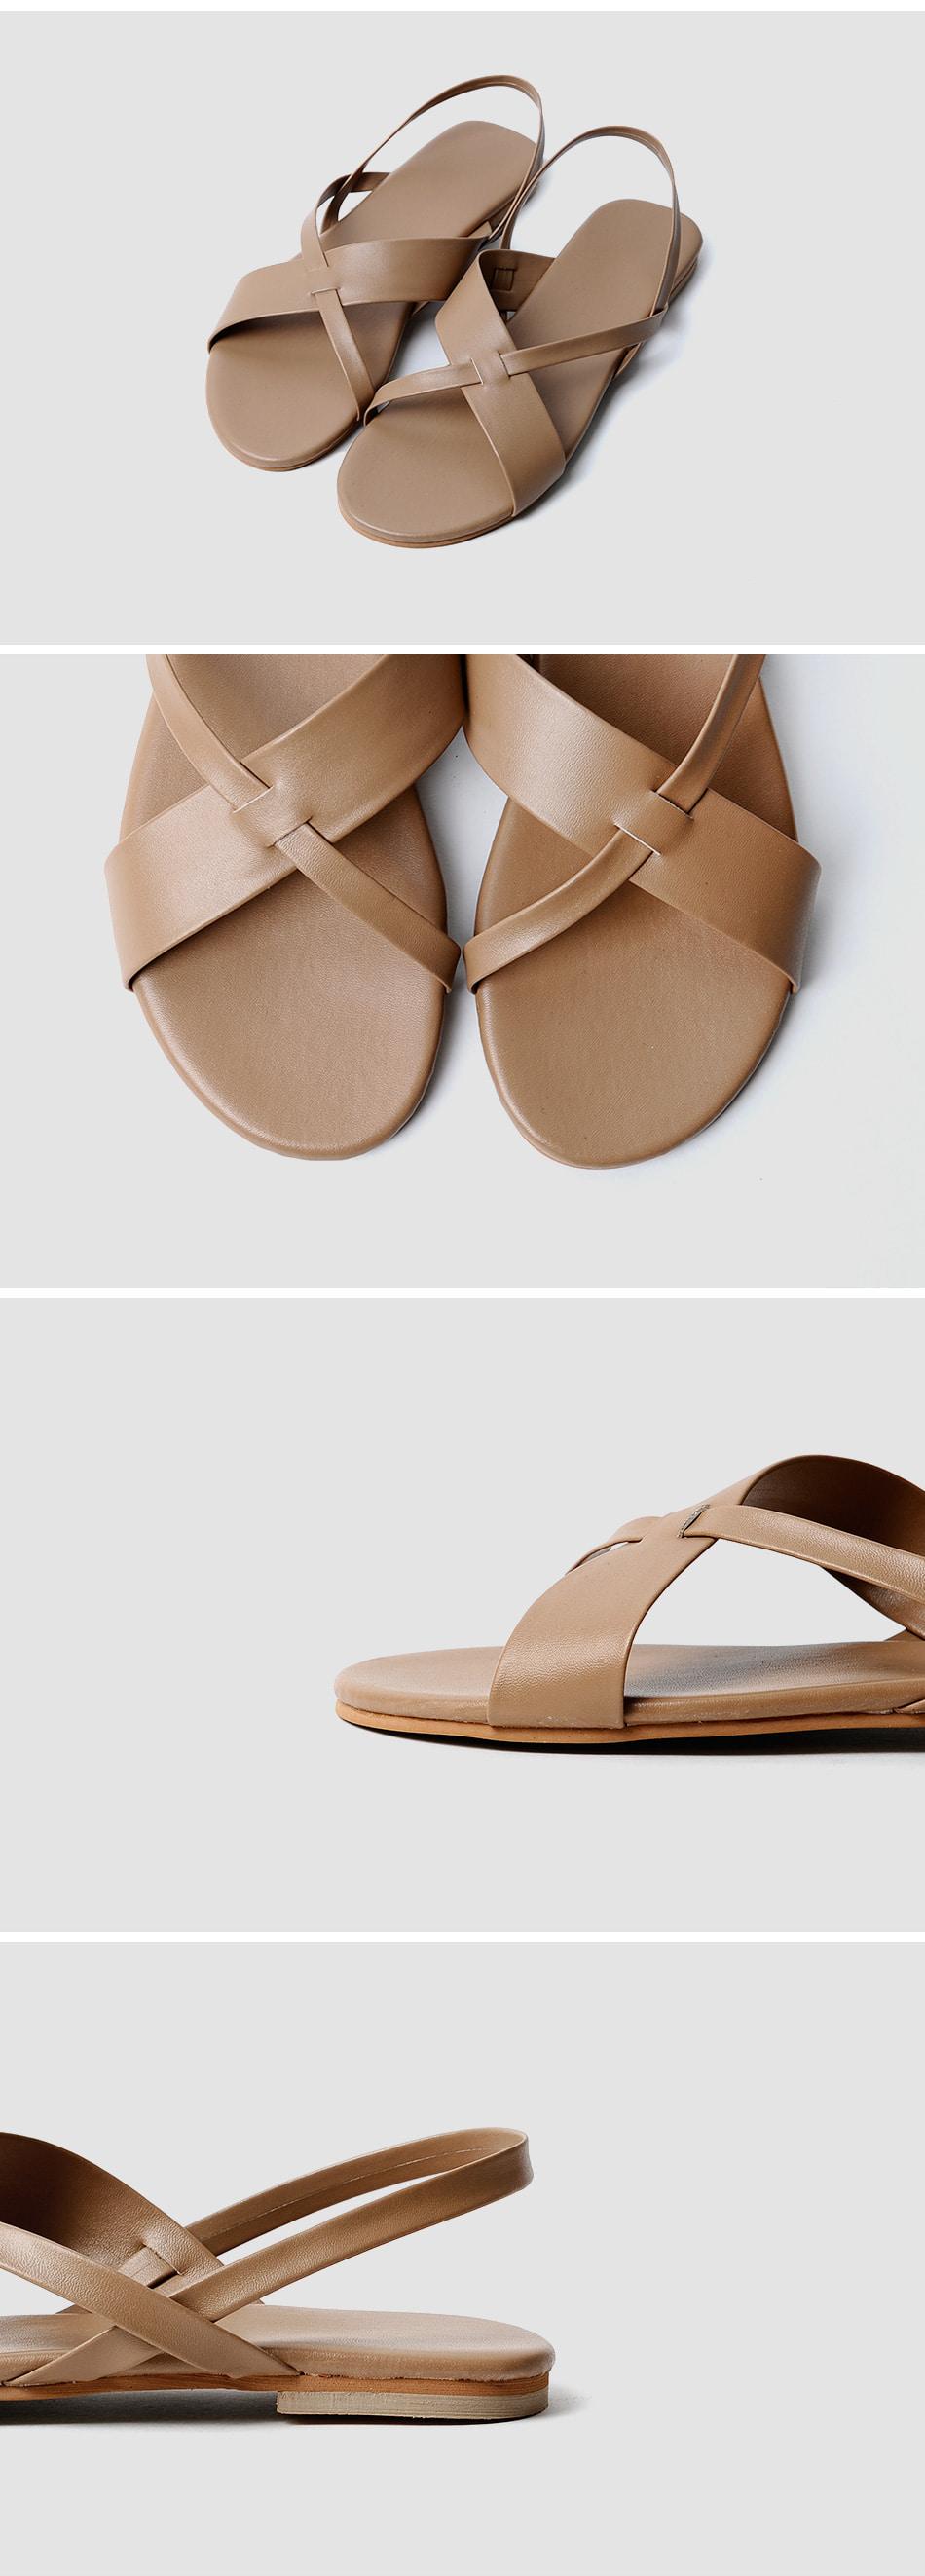 Verdi Slingback Sandals 1cm